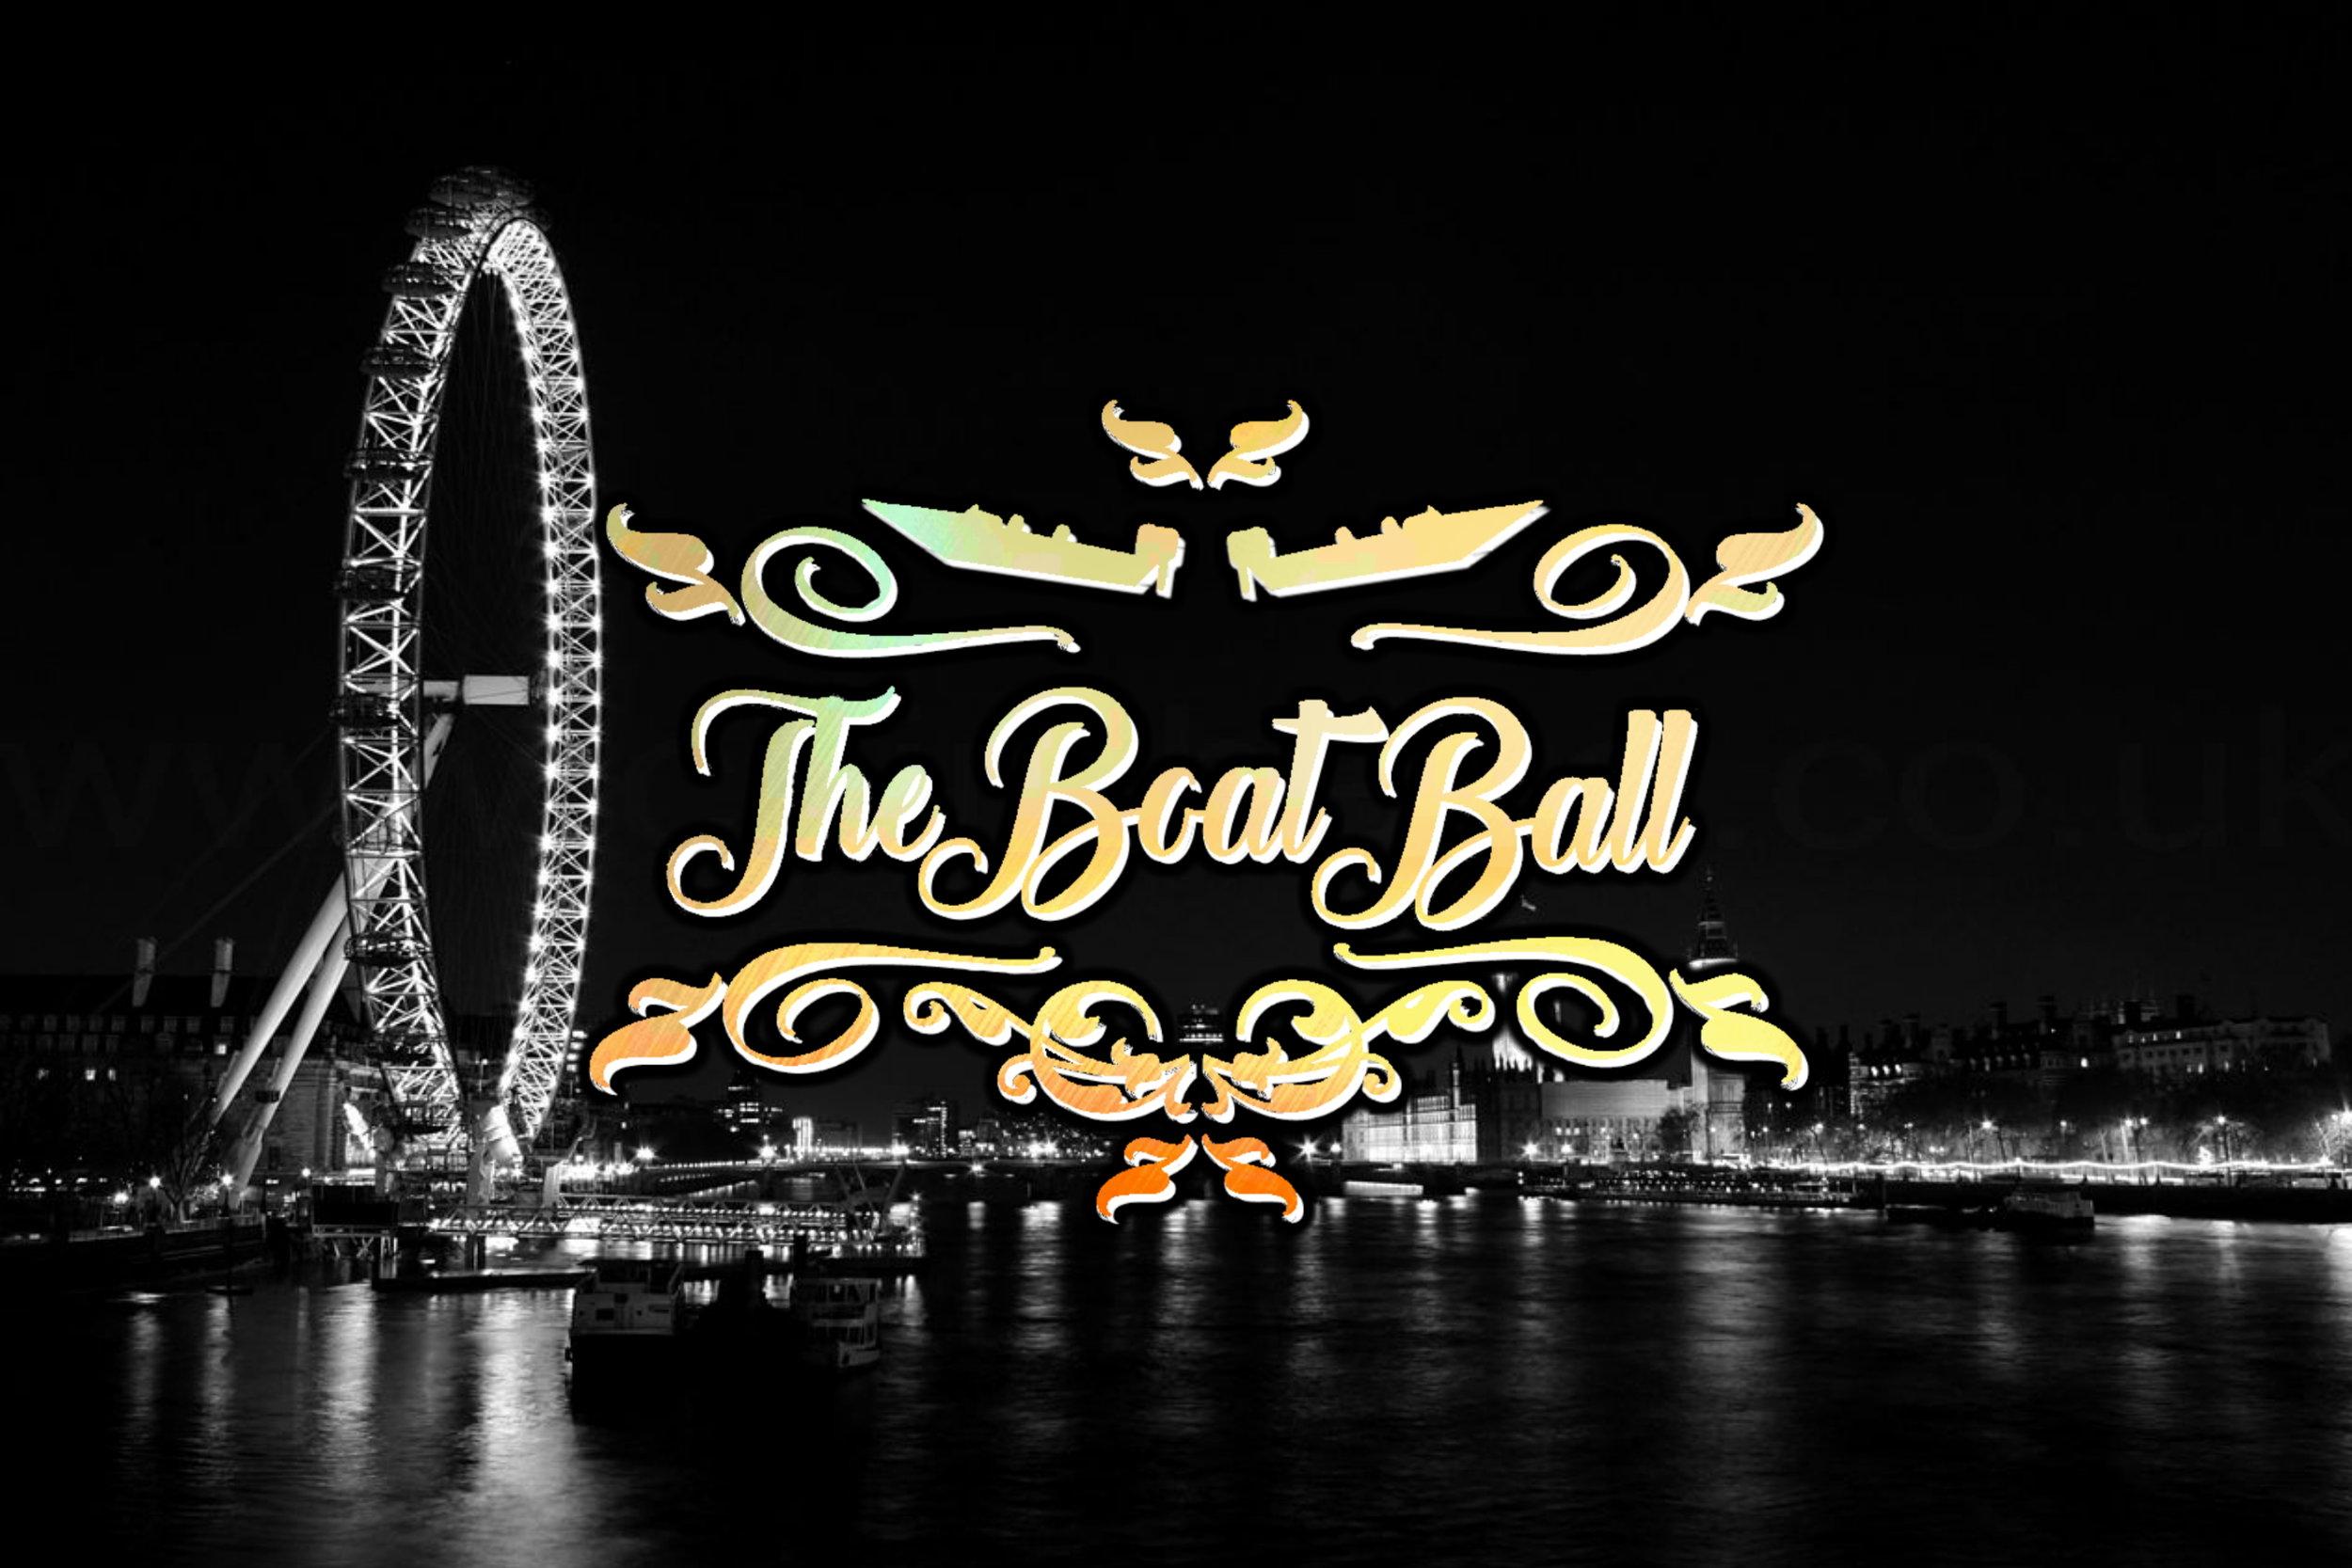 BoatBall.jpg